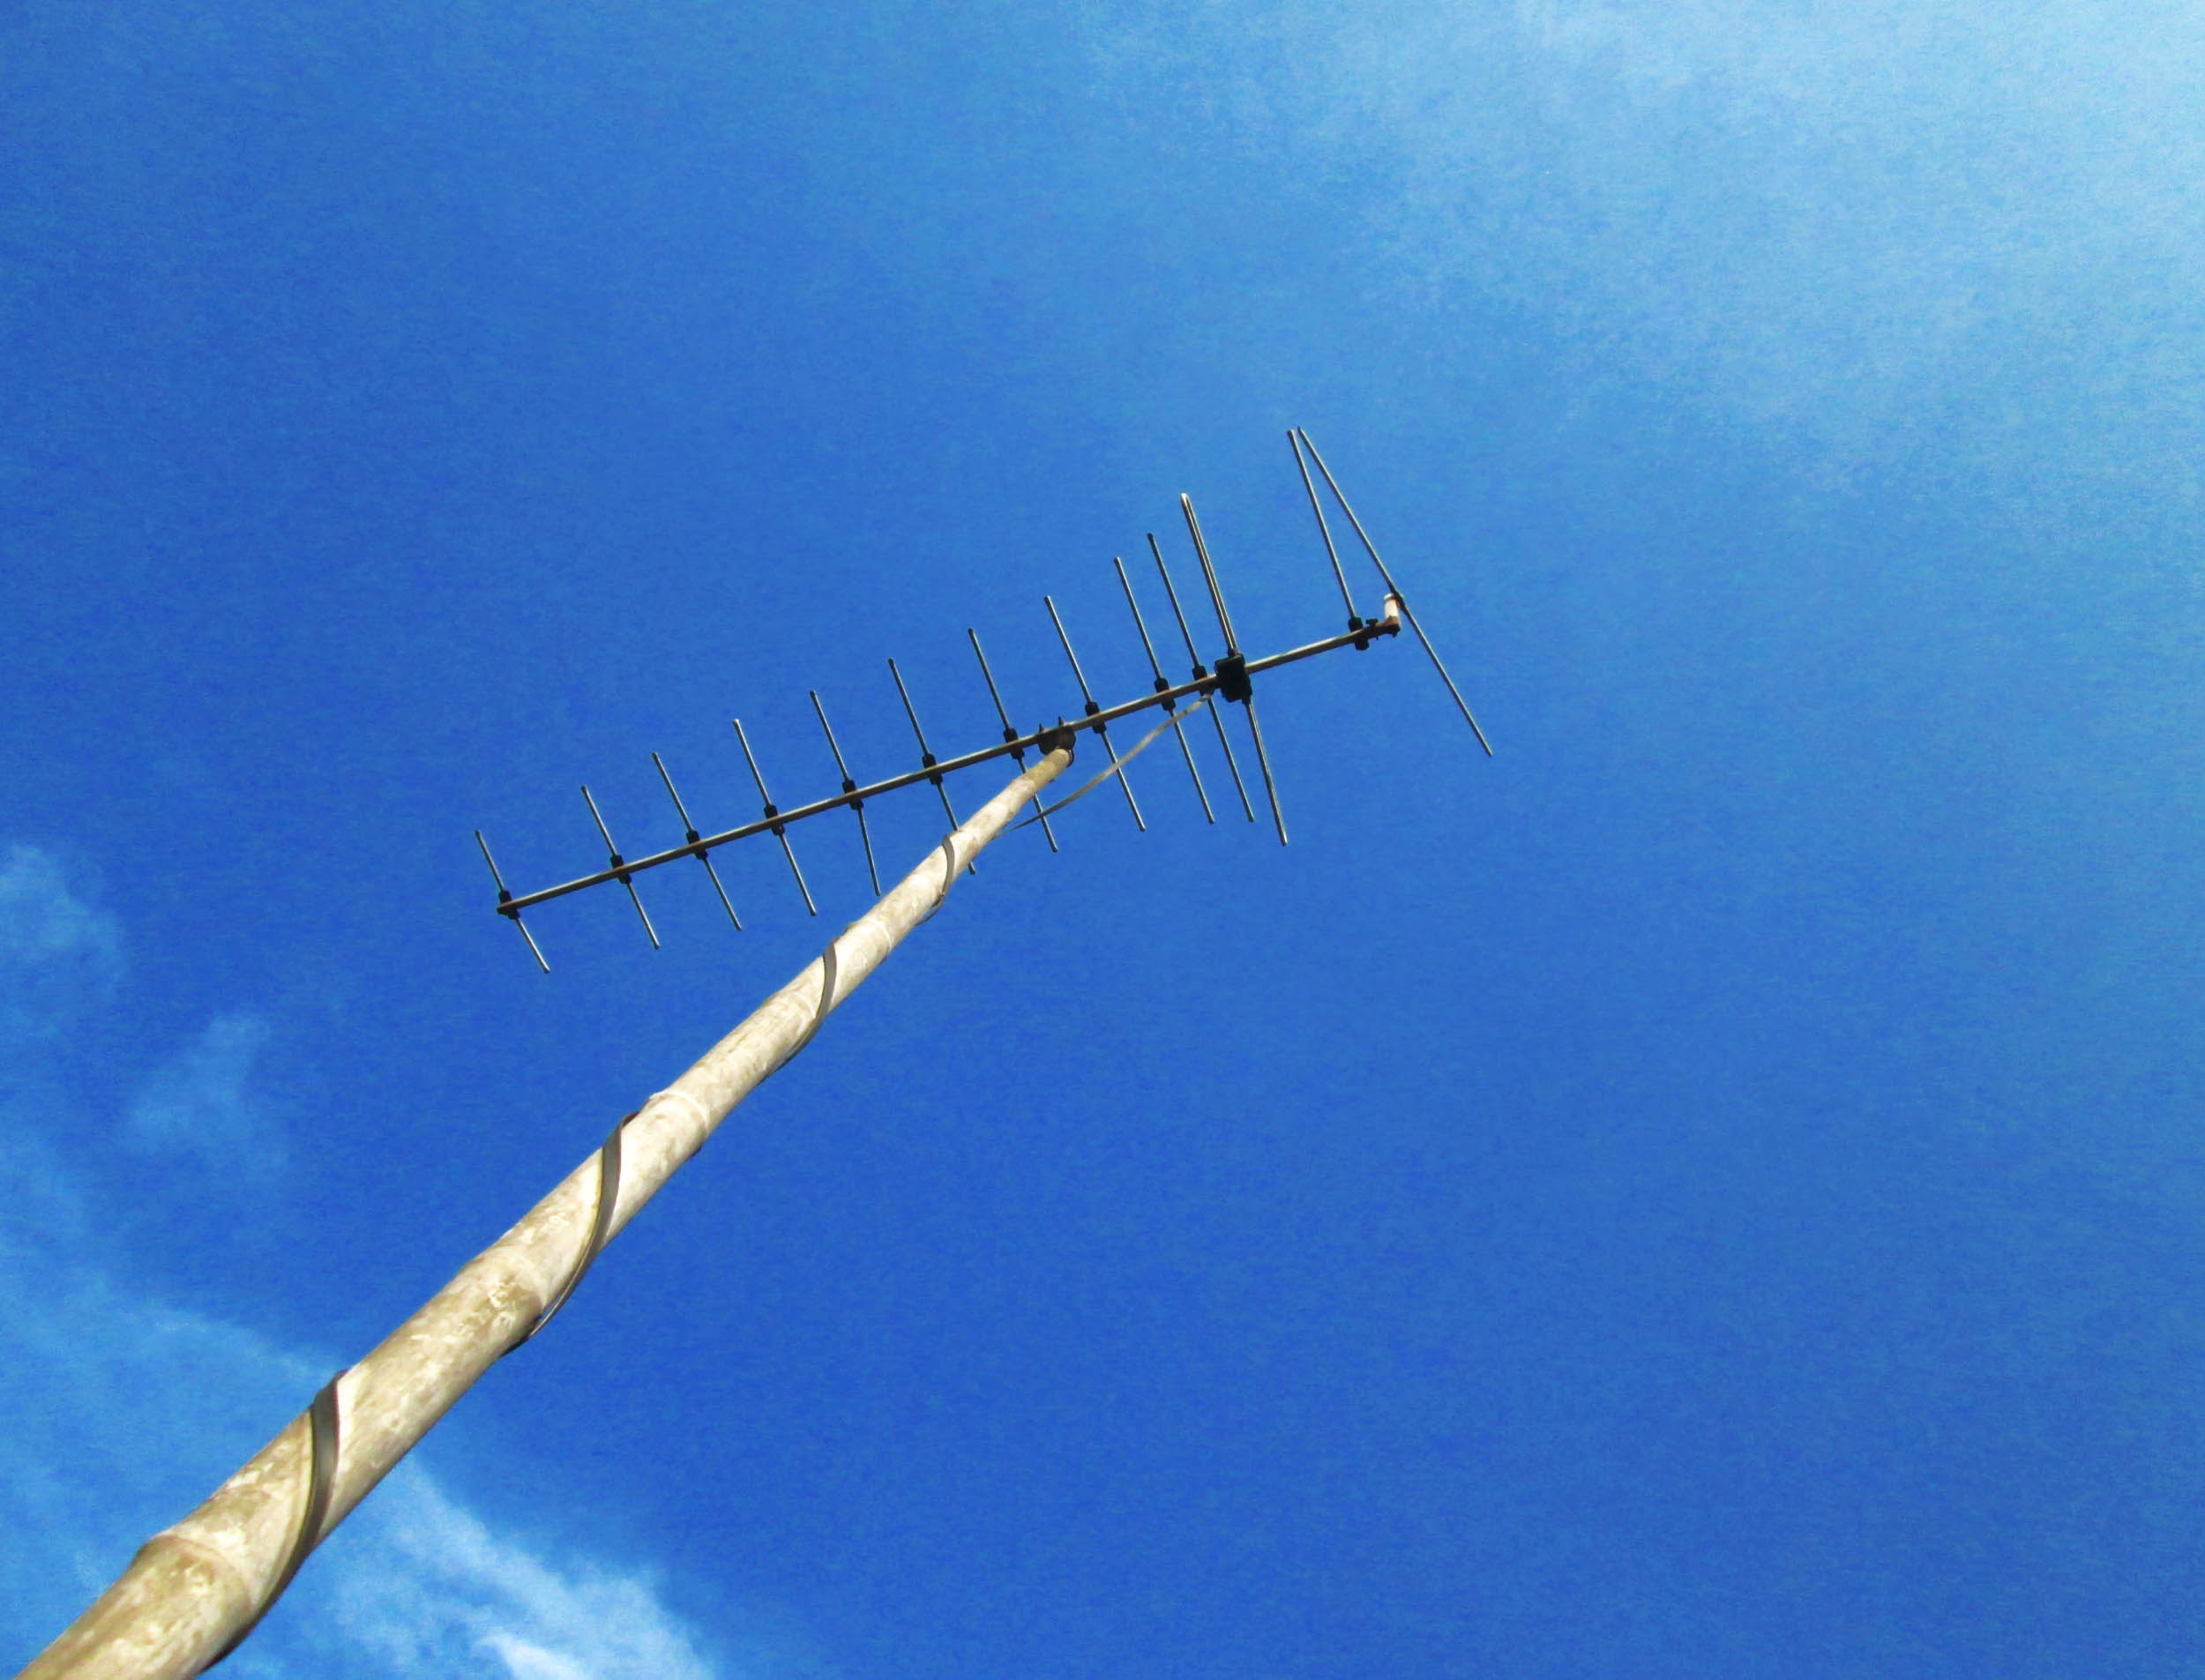 TV antenna, Antenna, Bluesky, Electronics, Sky, HQ Photo